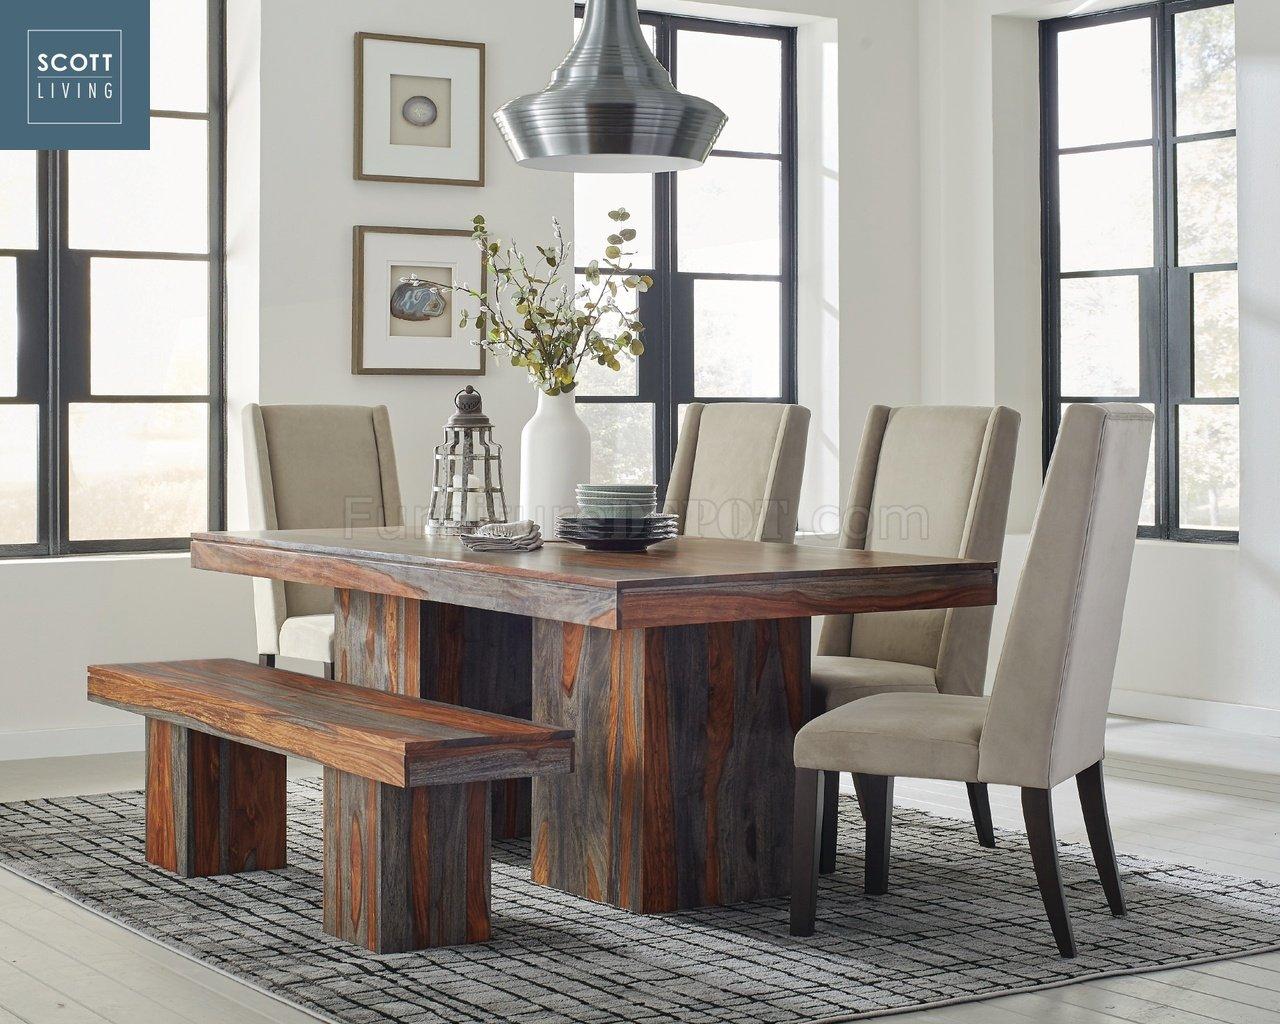 Binghamton 107481  Scott Living  Coaster  Dining Table